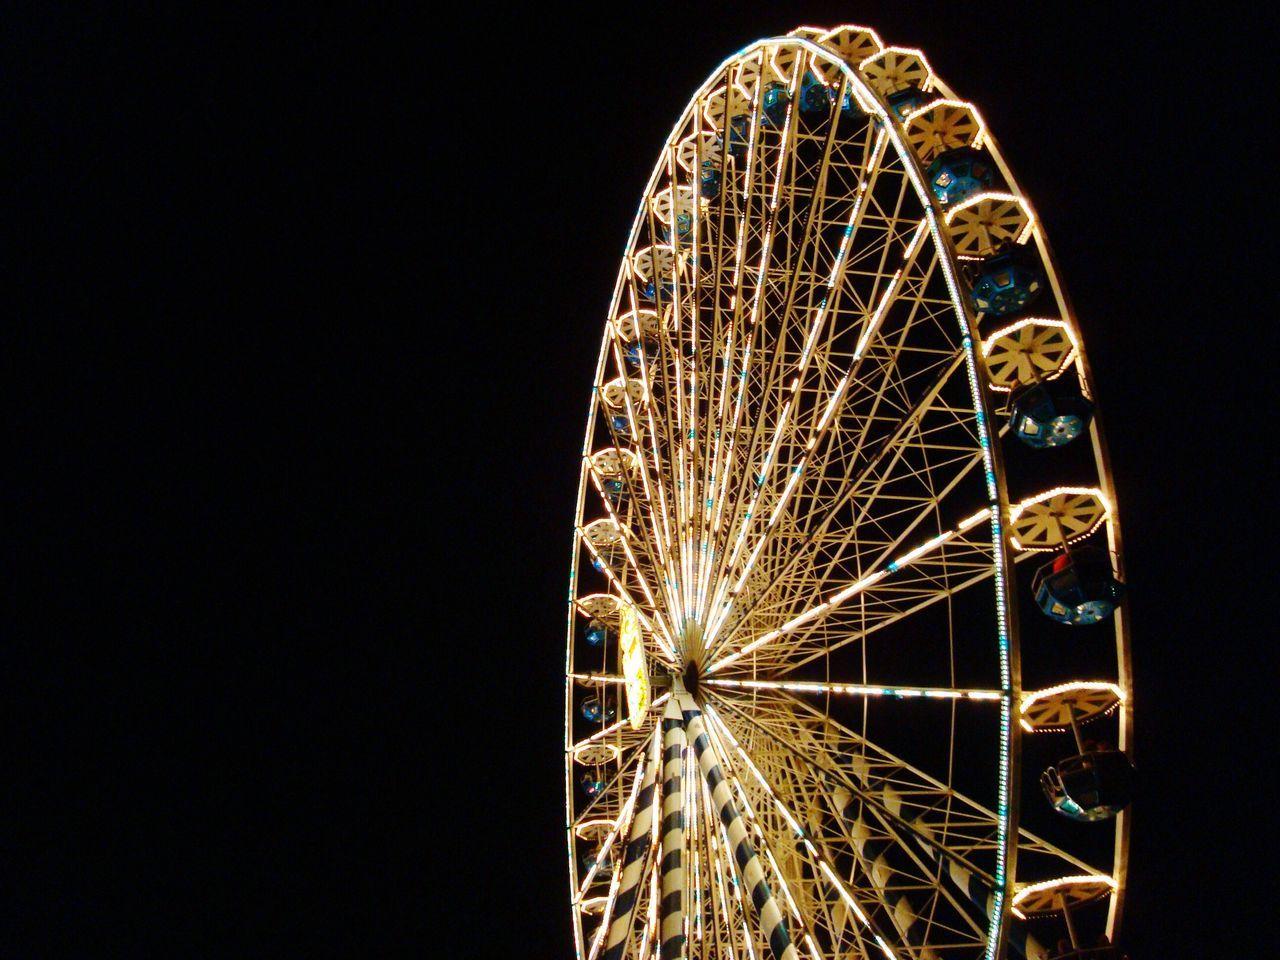 Riesenrad Ferry Wheel Arts Culture And Entertainment Amusementpark Night Illuminated